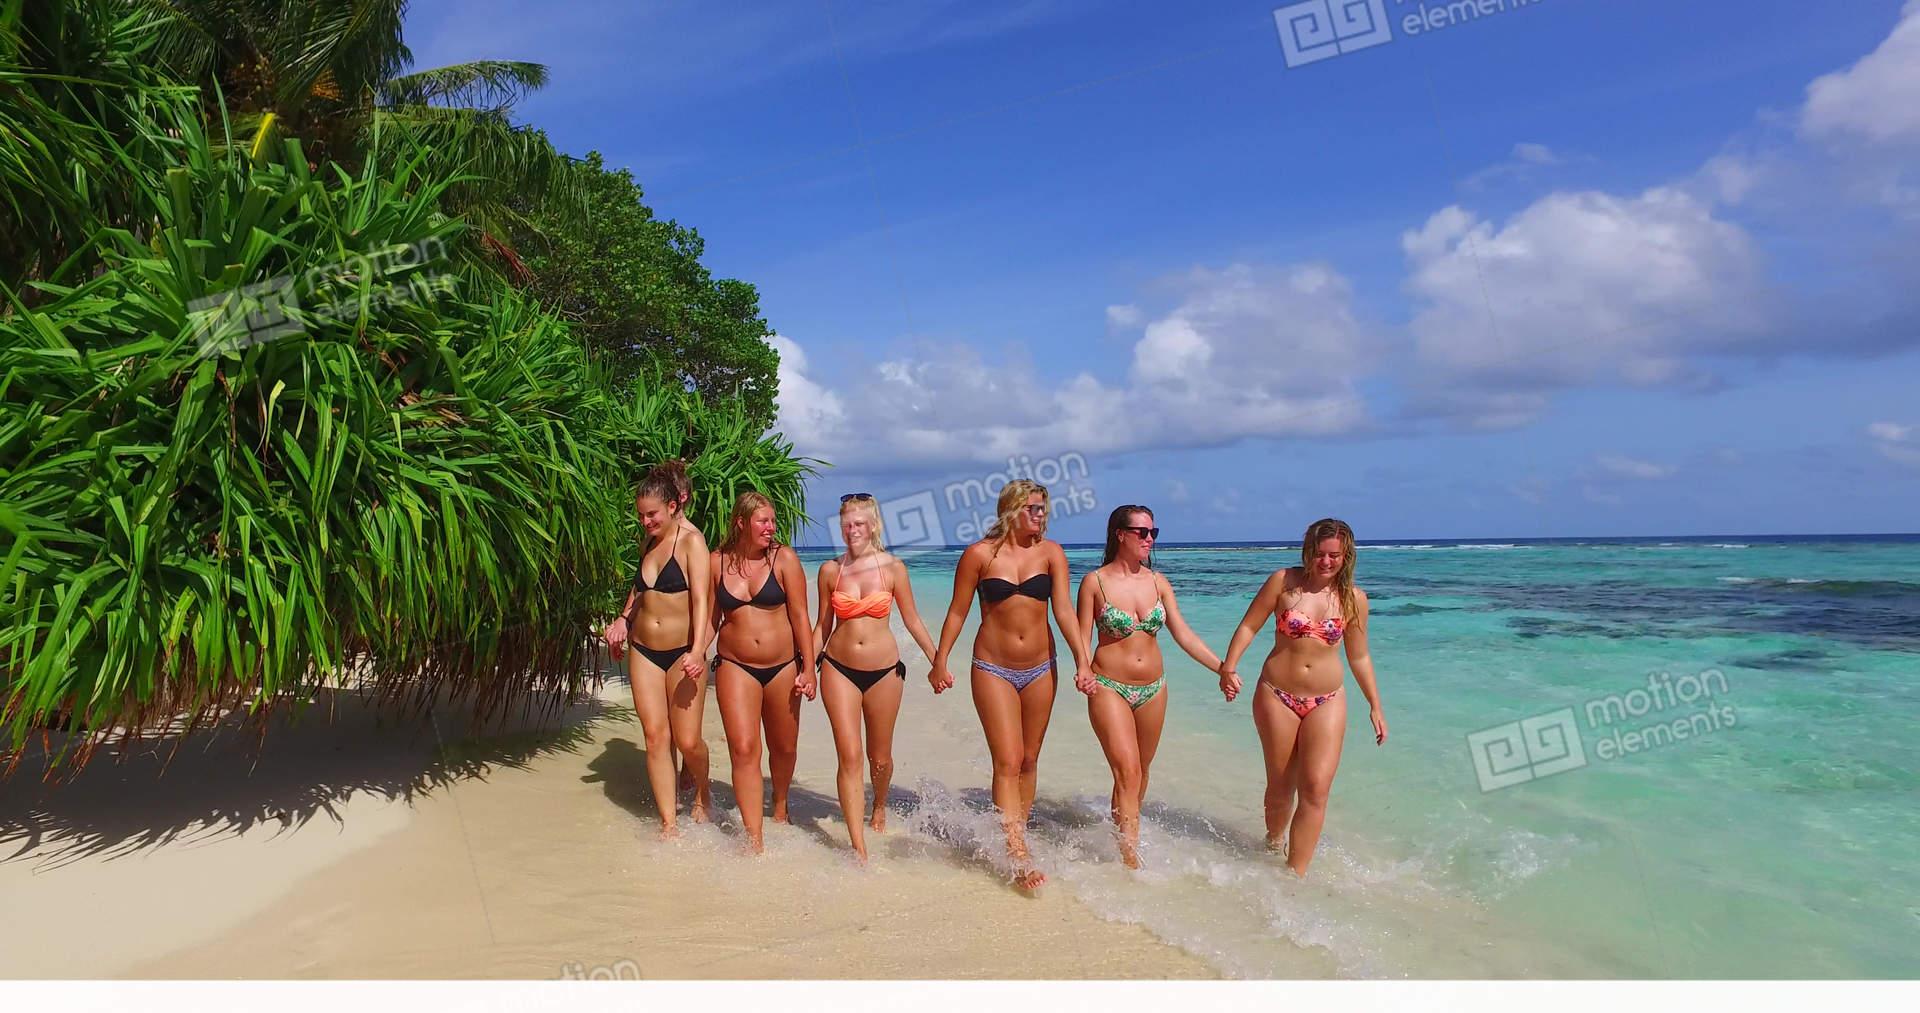 Group young teens in bikinis model